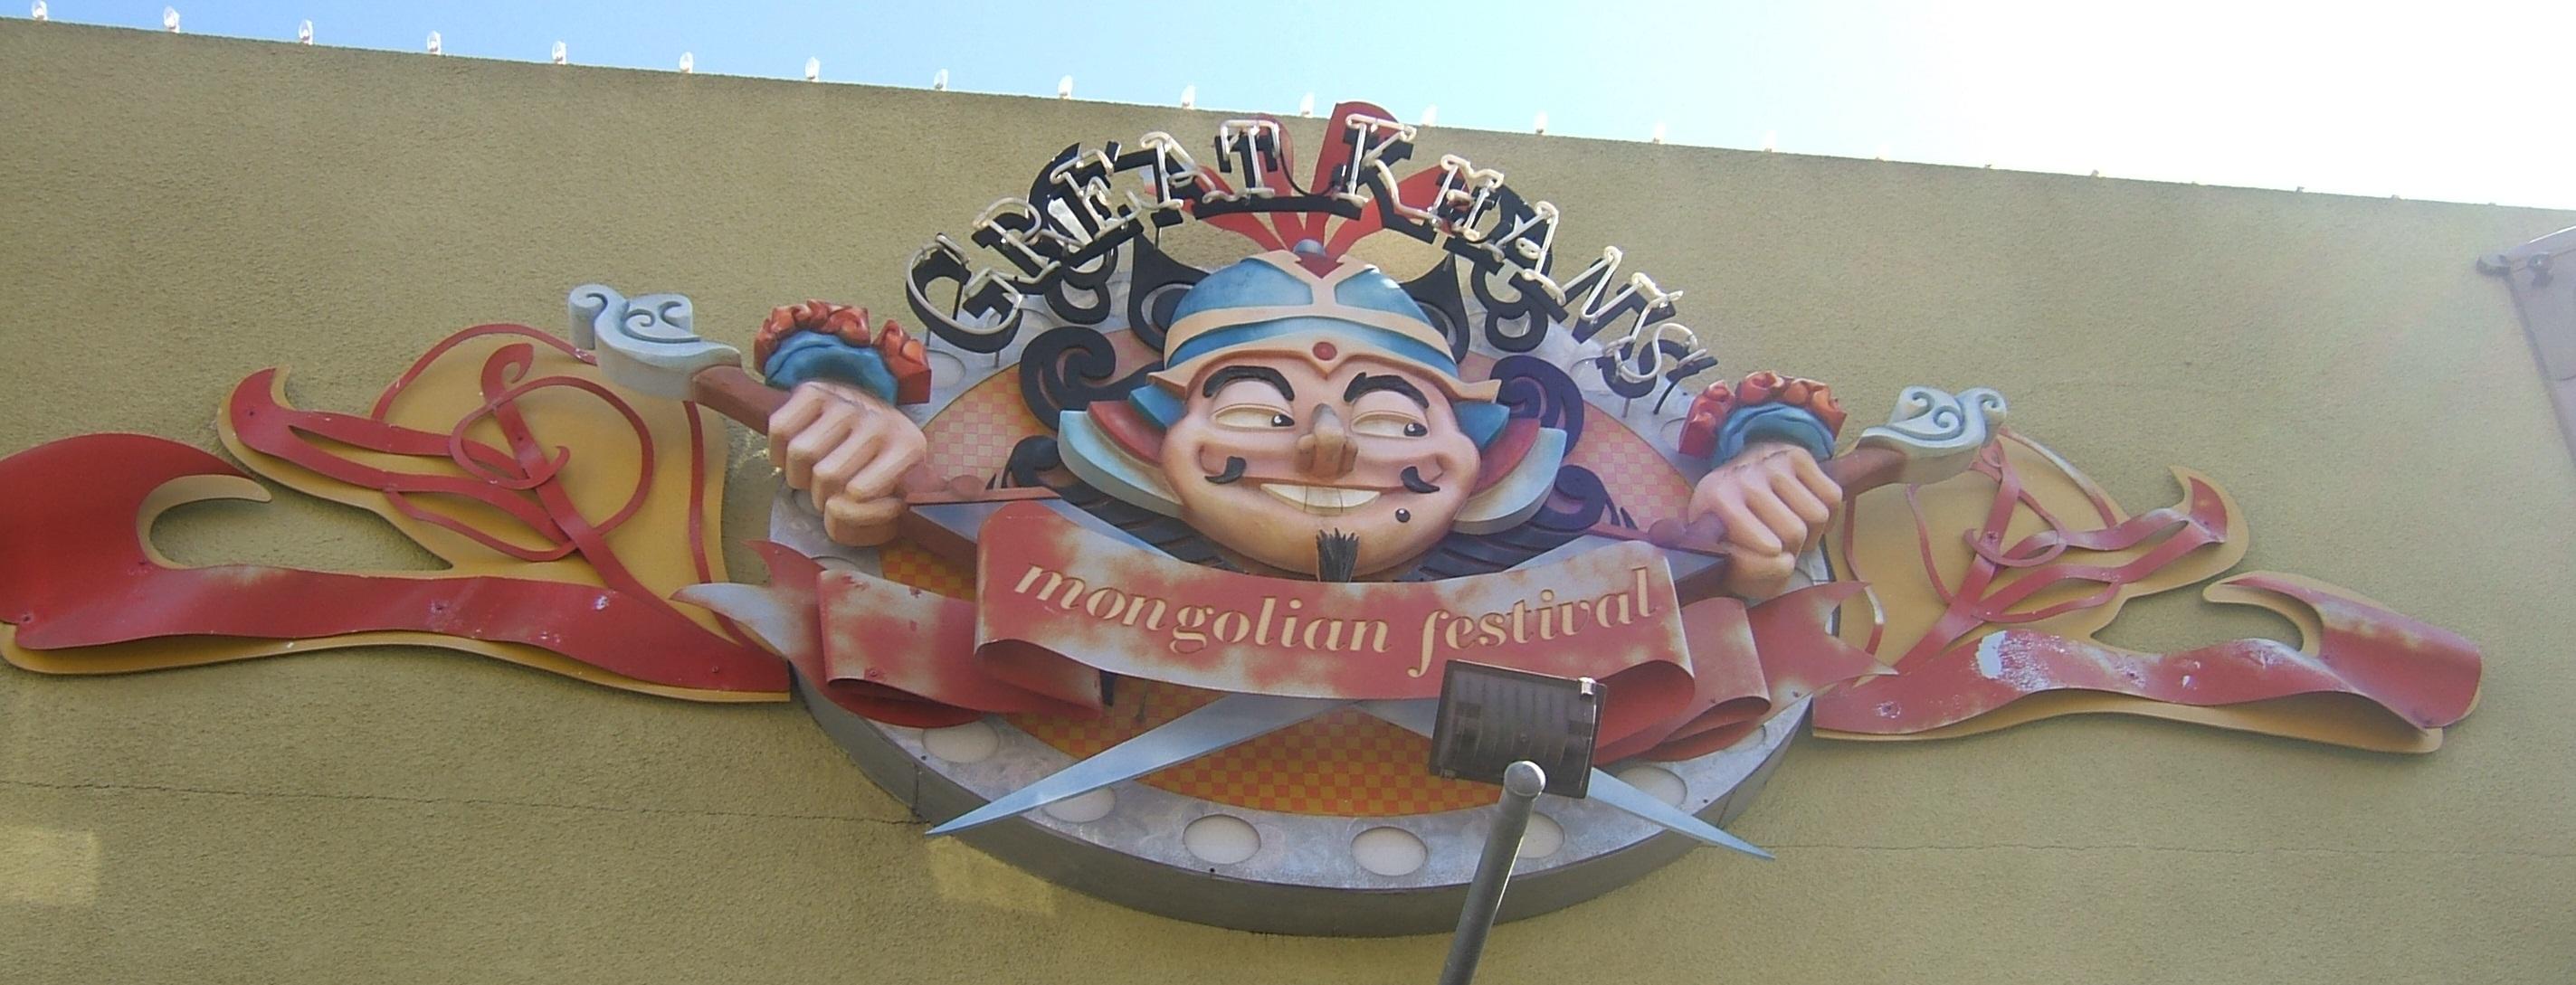 Horton Plaza Food Court List